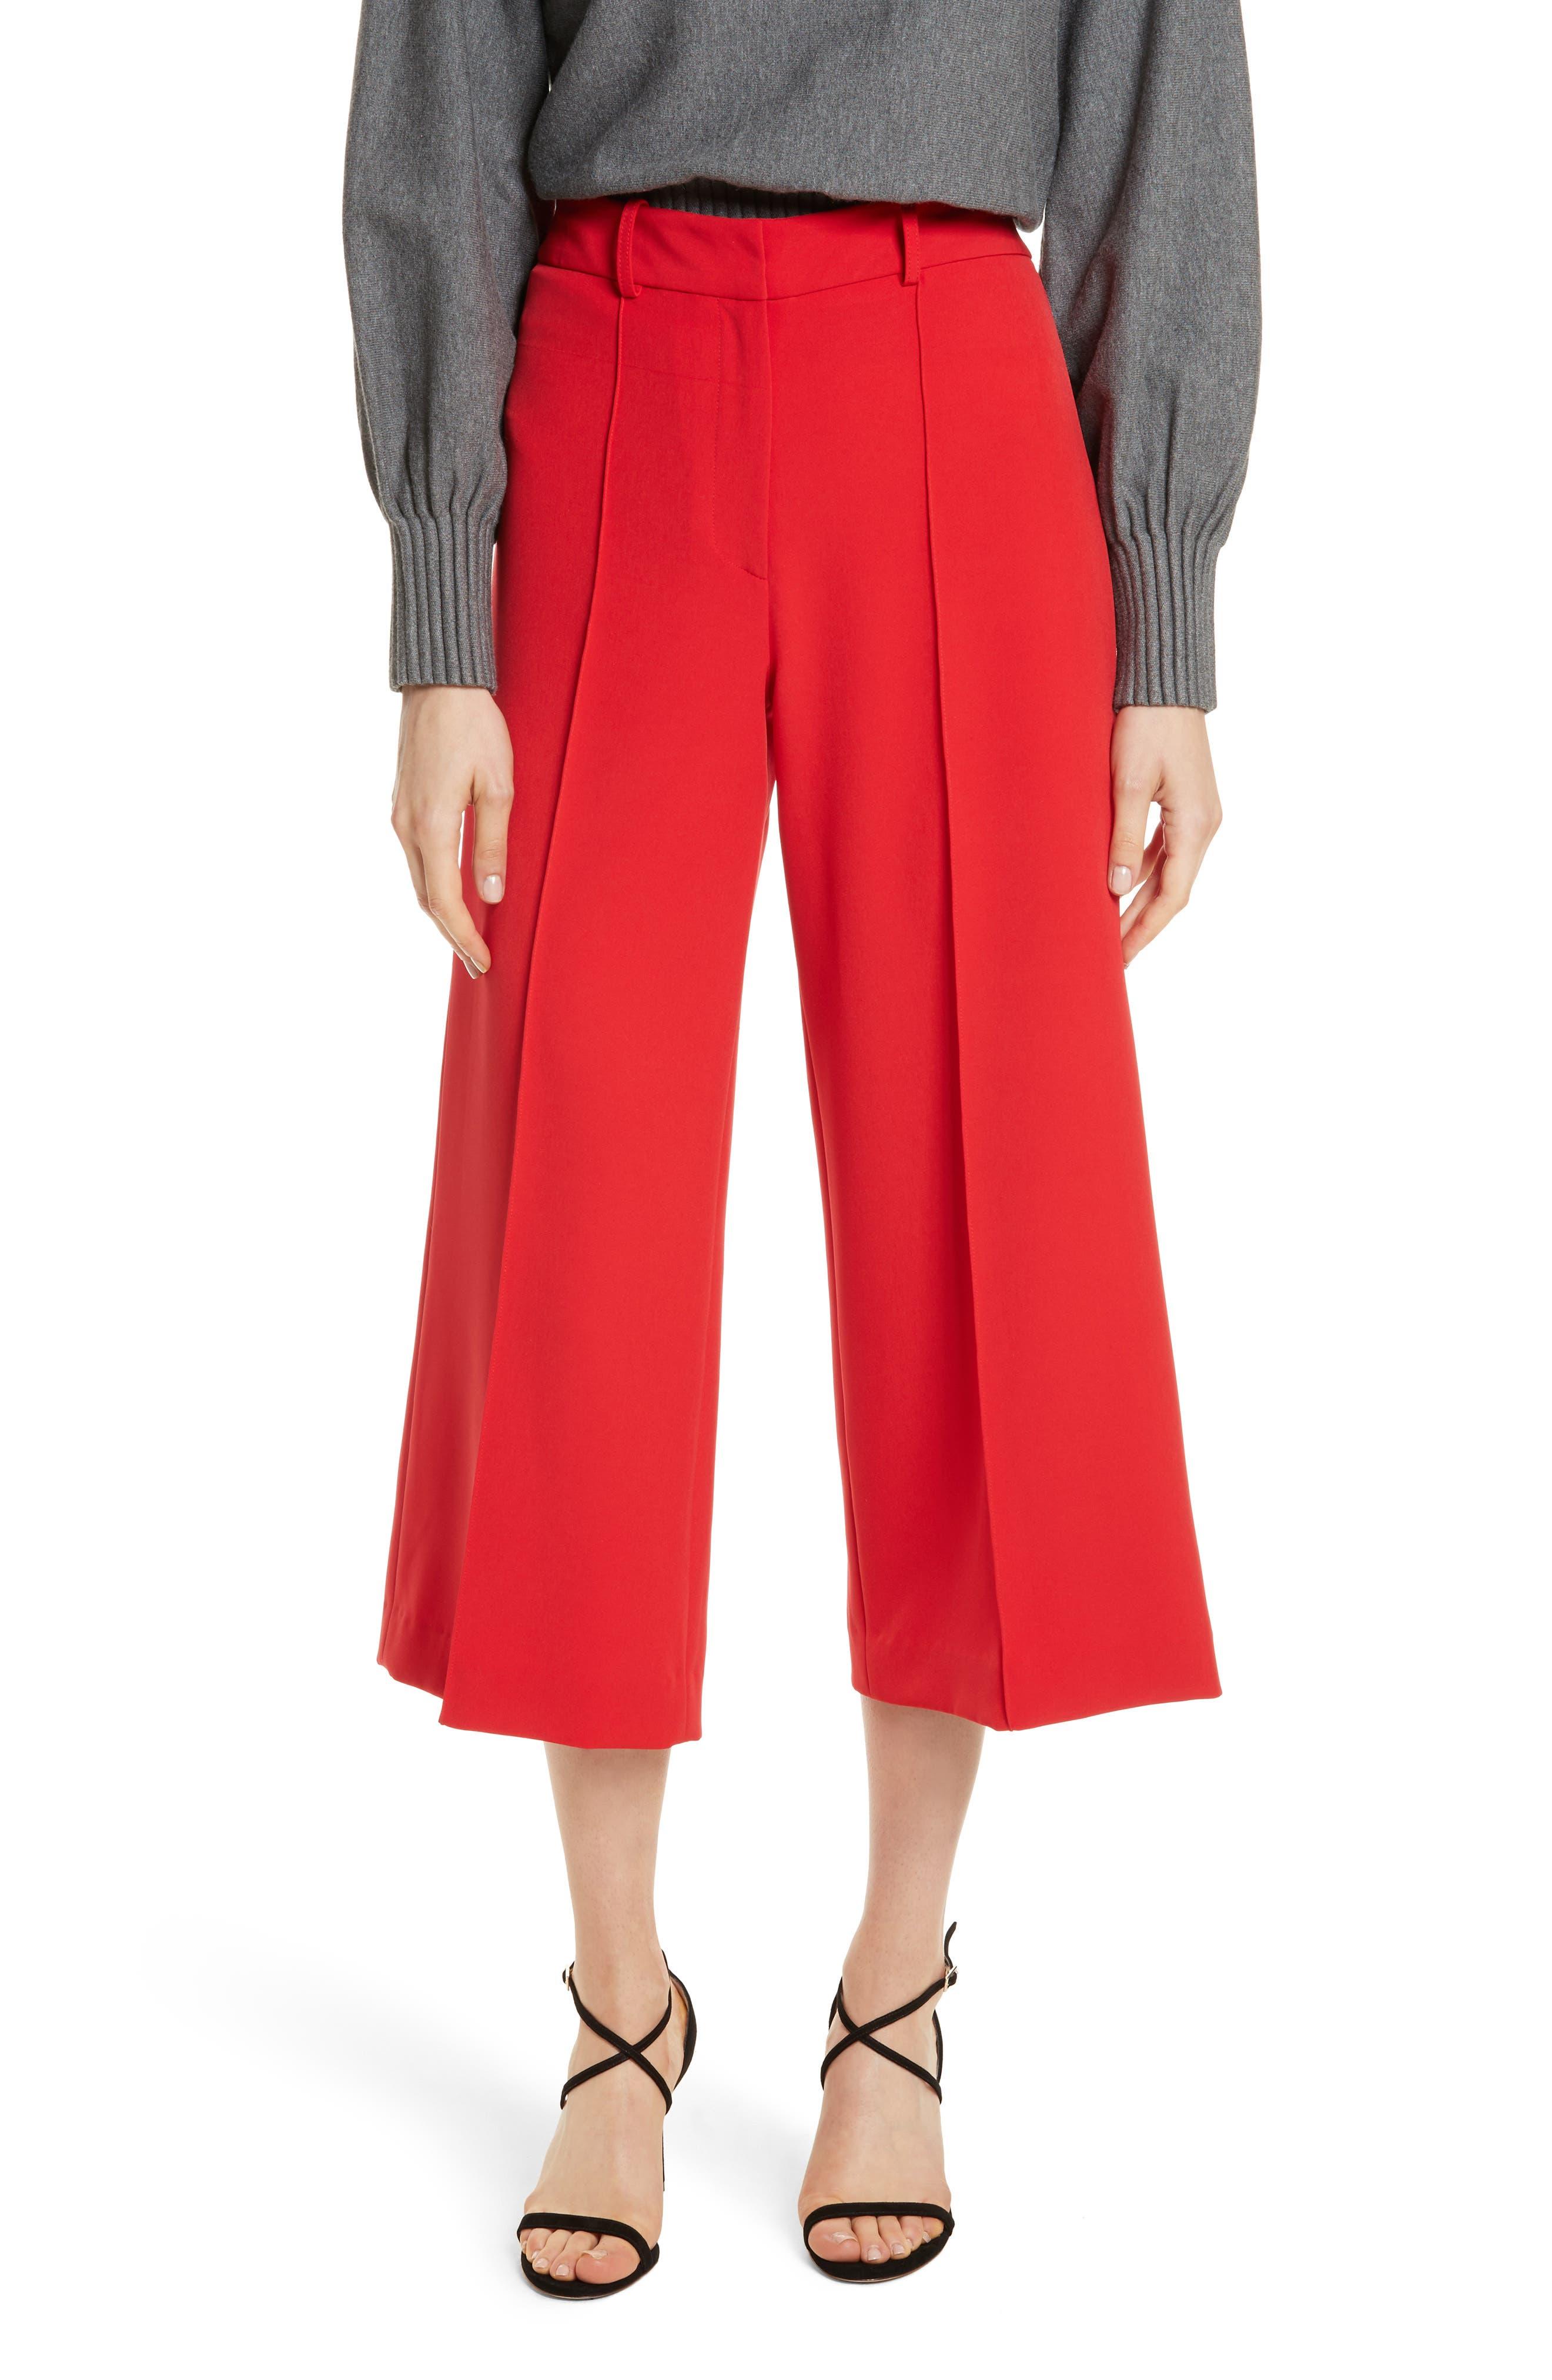 Milly Hayden Italian Cady Crop Pants